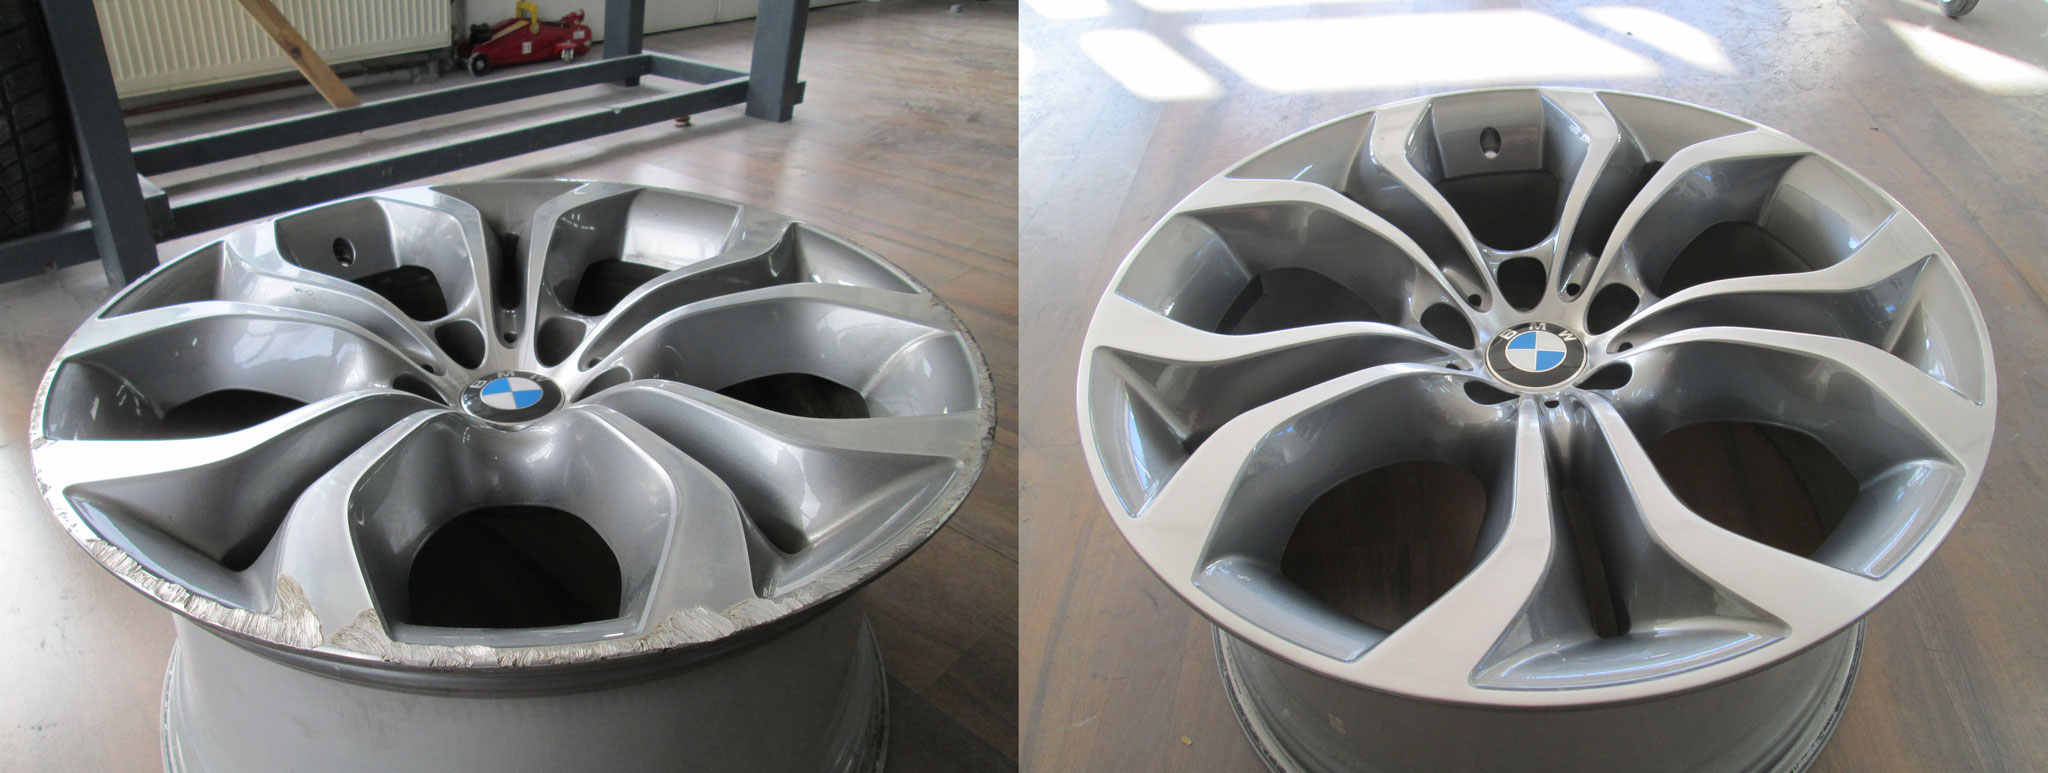 Felgen- & Scheinwerferaufbereitung - Jungmann - Felgenreparatur